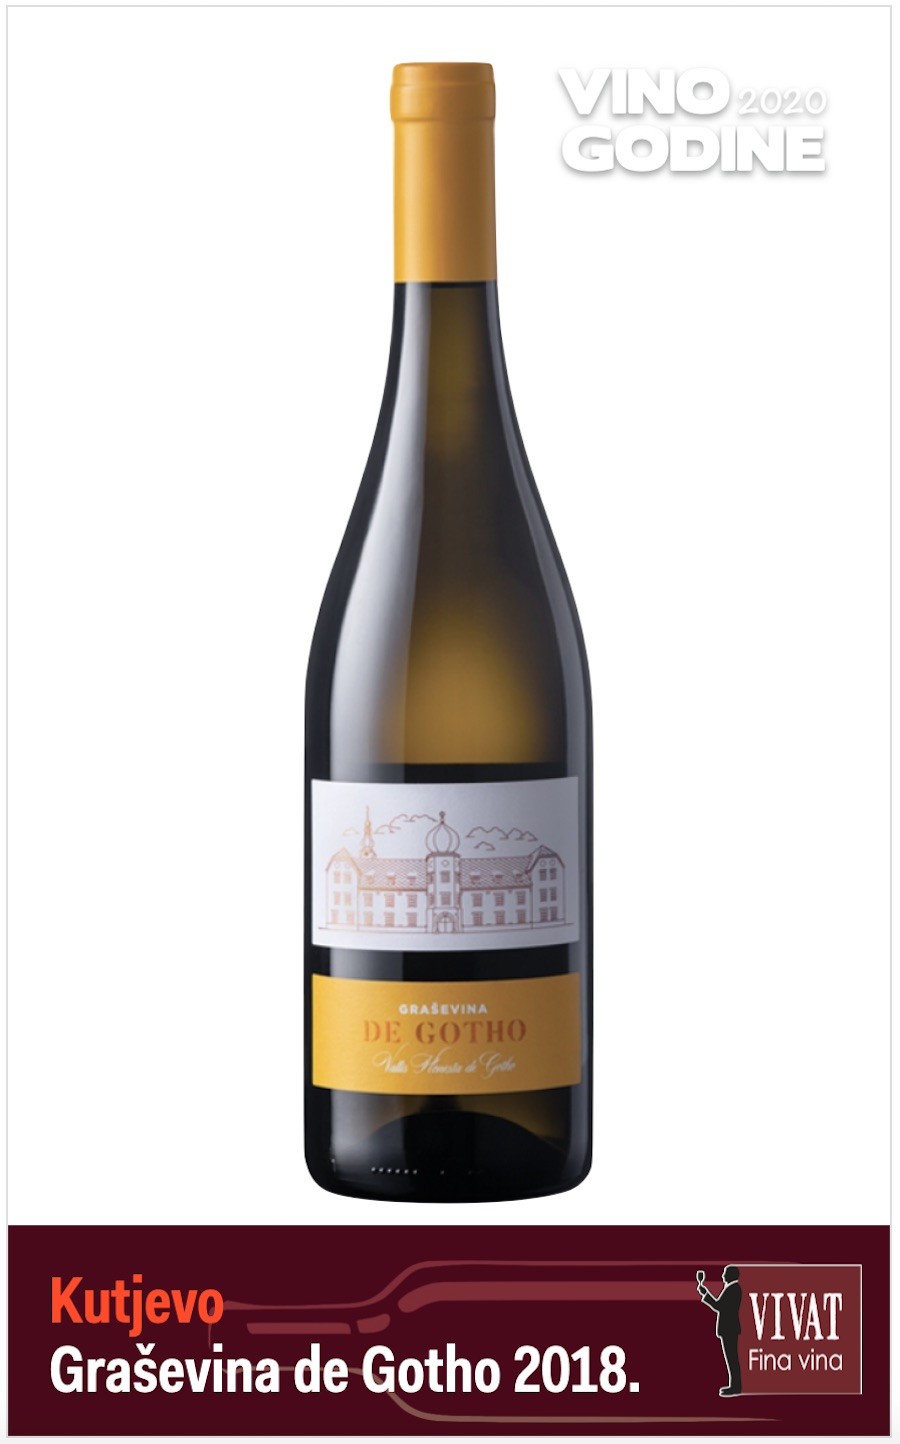 vino-godine-2020-kutjevo-de-gotho